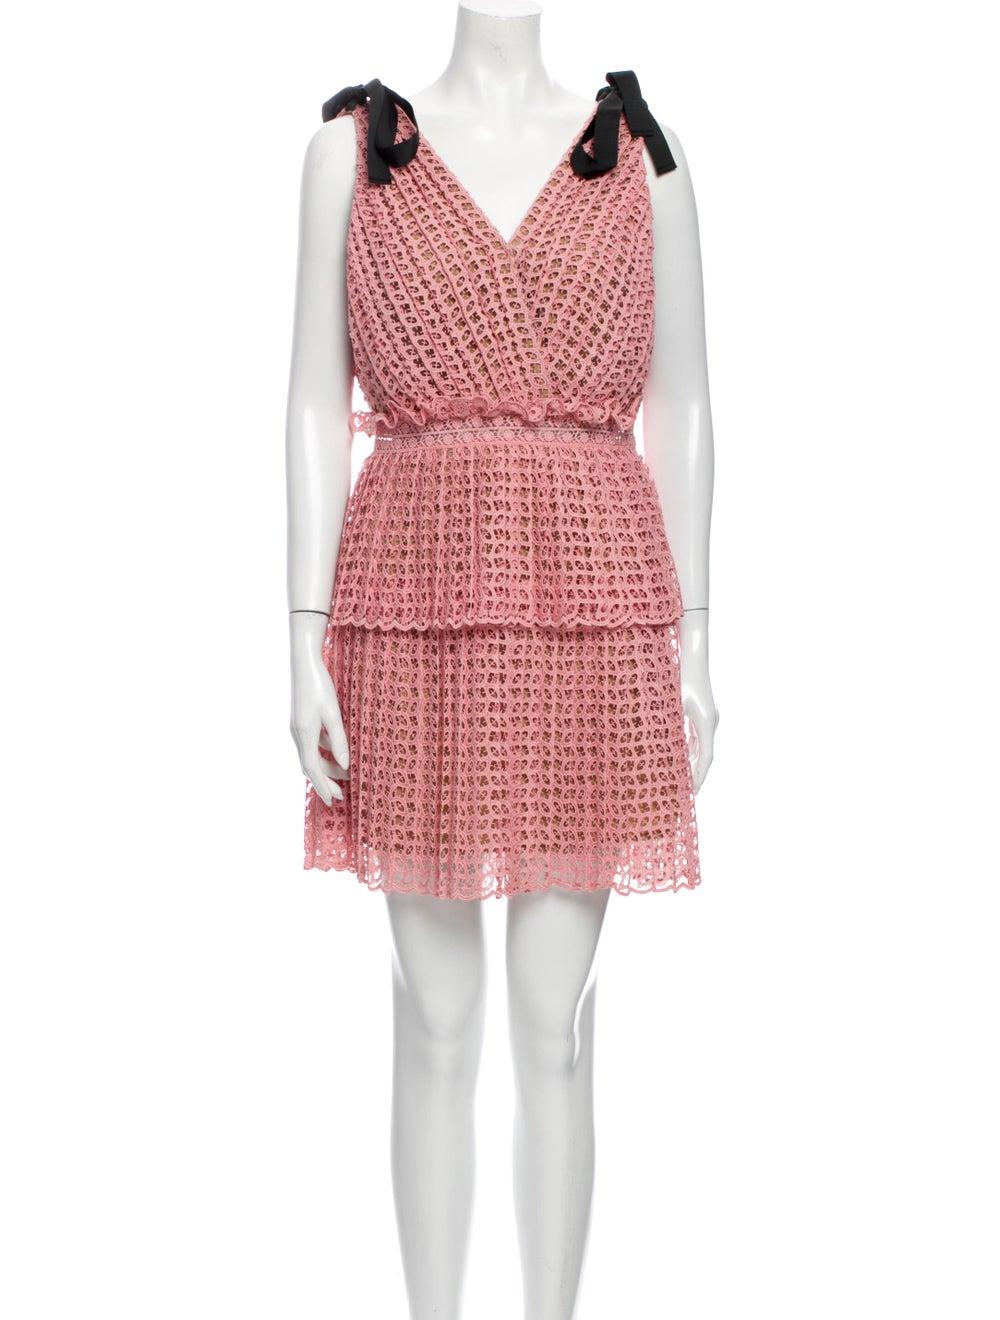 Self-Portrait Printed Mini Dress Pink - image 1